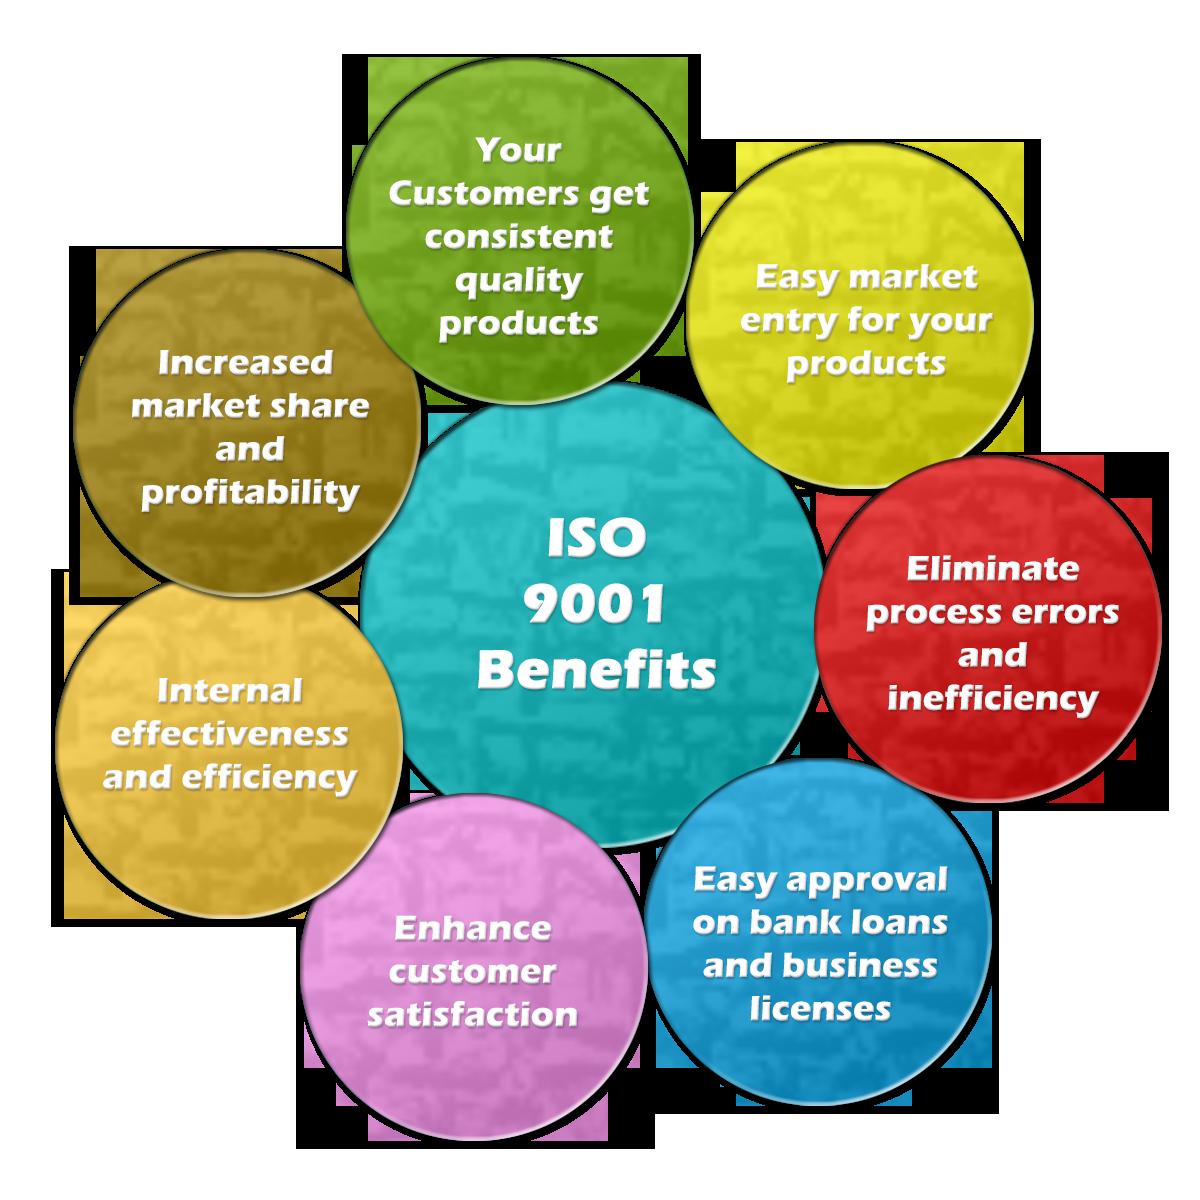 Iso 90012008 certification mumbai iso 9001 certificate mumbai iso 9001 benefits xflitez Images